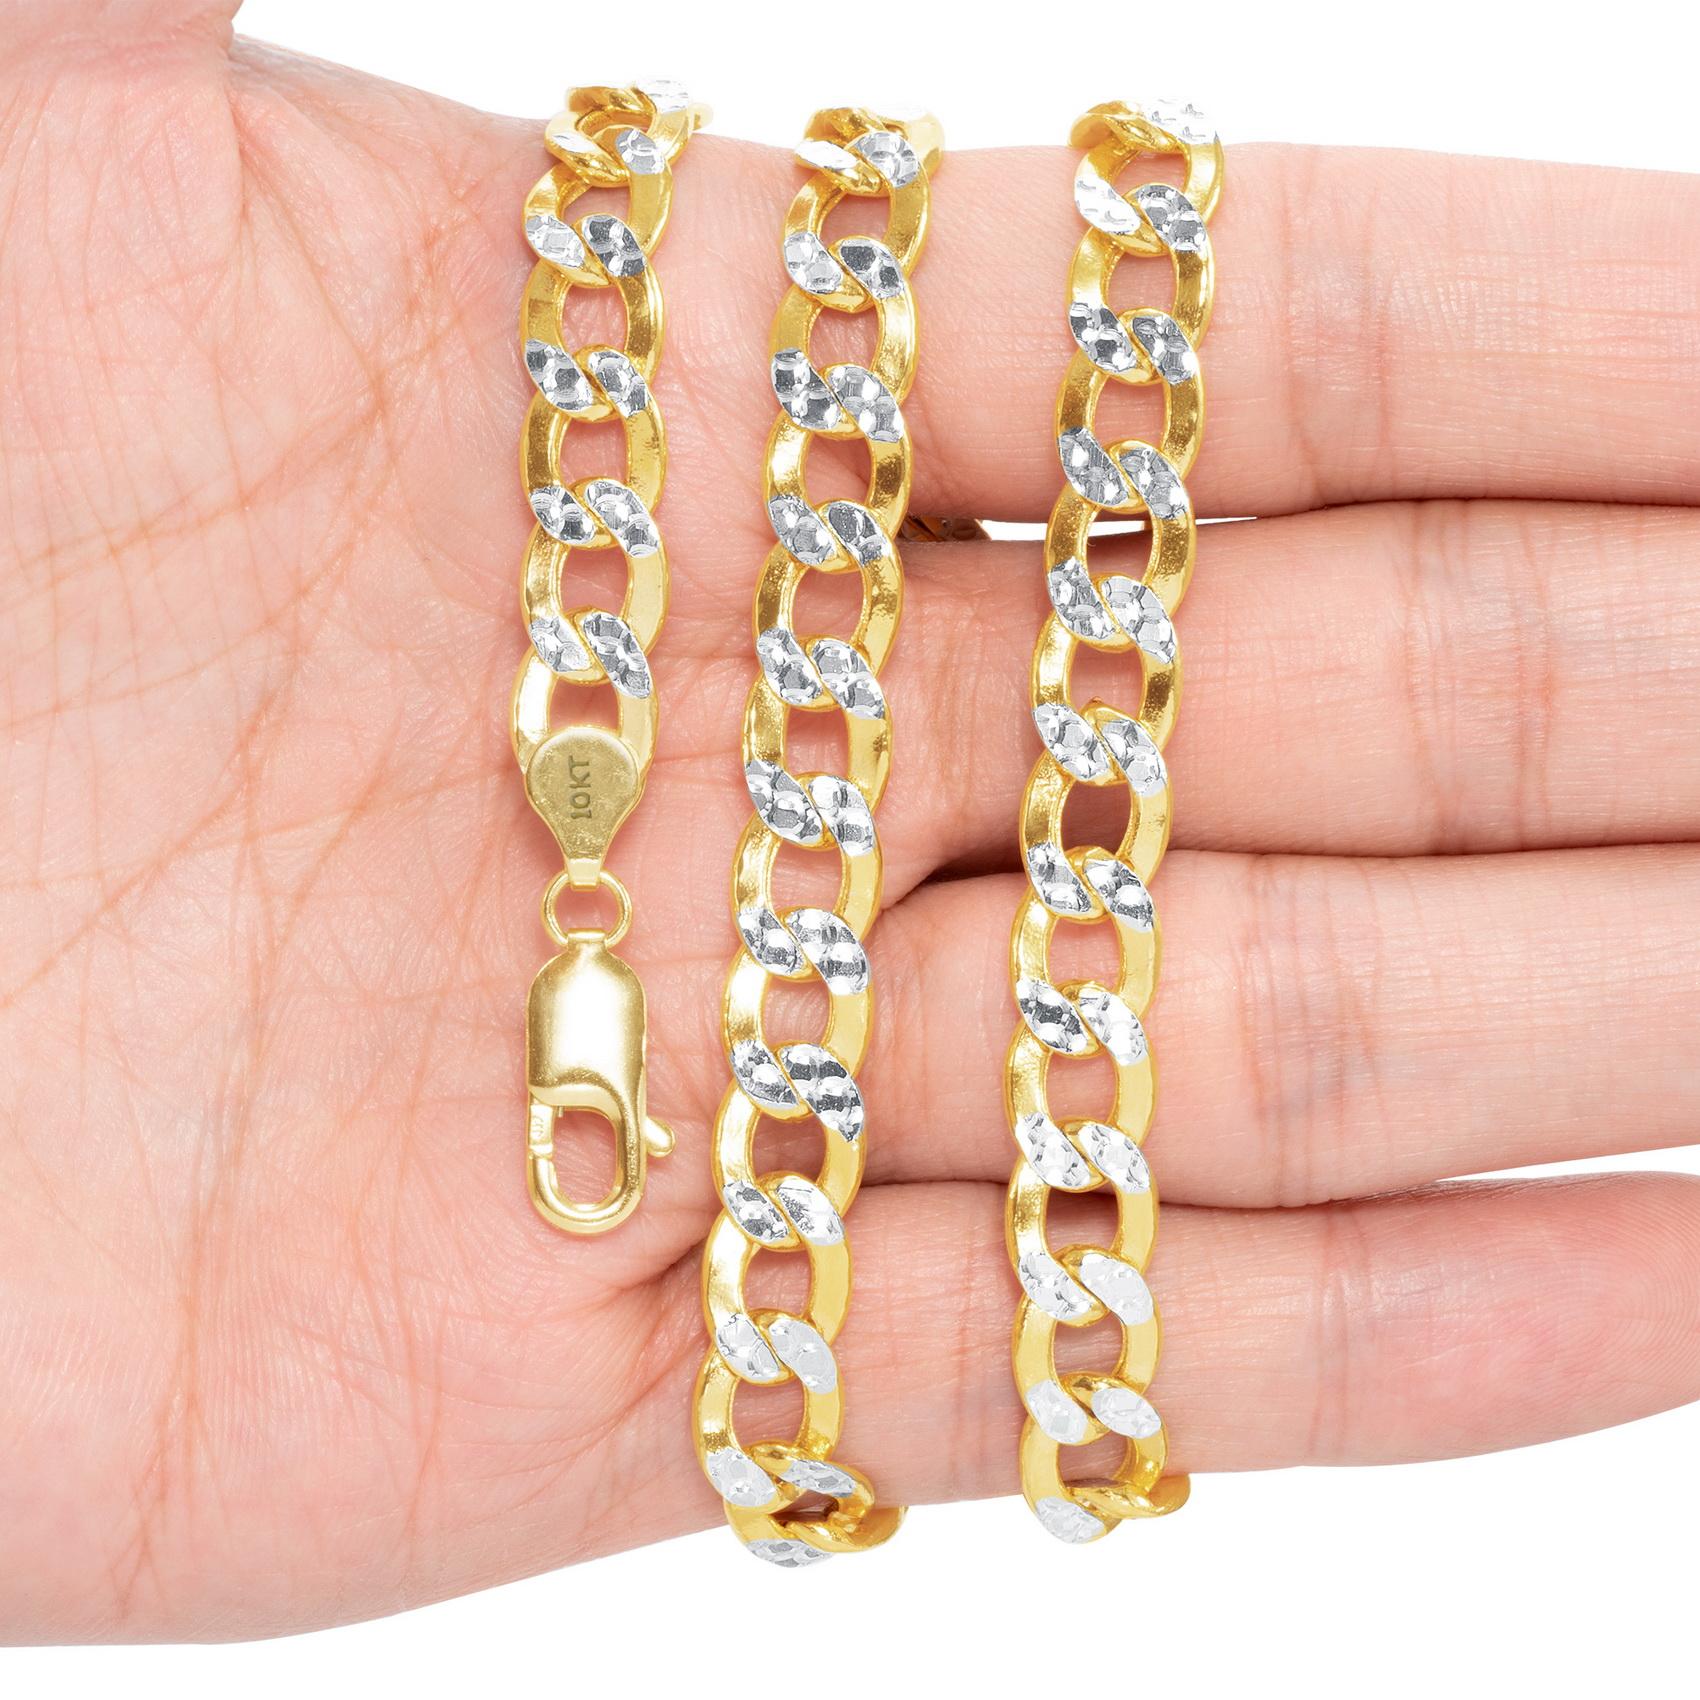 10K-Yellow-Gold-2mm-10-5mm-Diamond-Cut-Pave-Cuban-Chain-Necklace-Bracelet-7-034-30-034 thumbnail 27